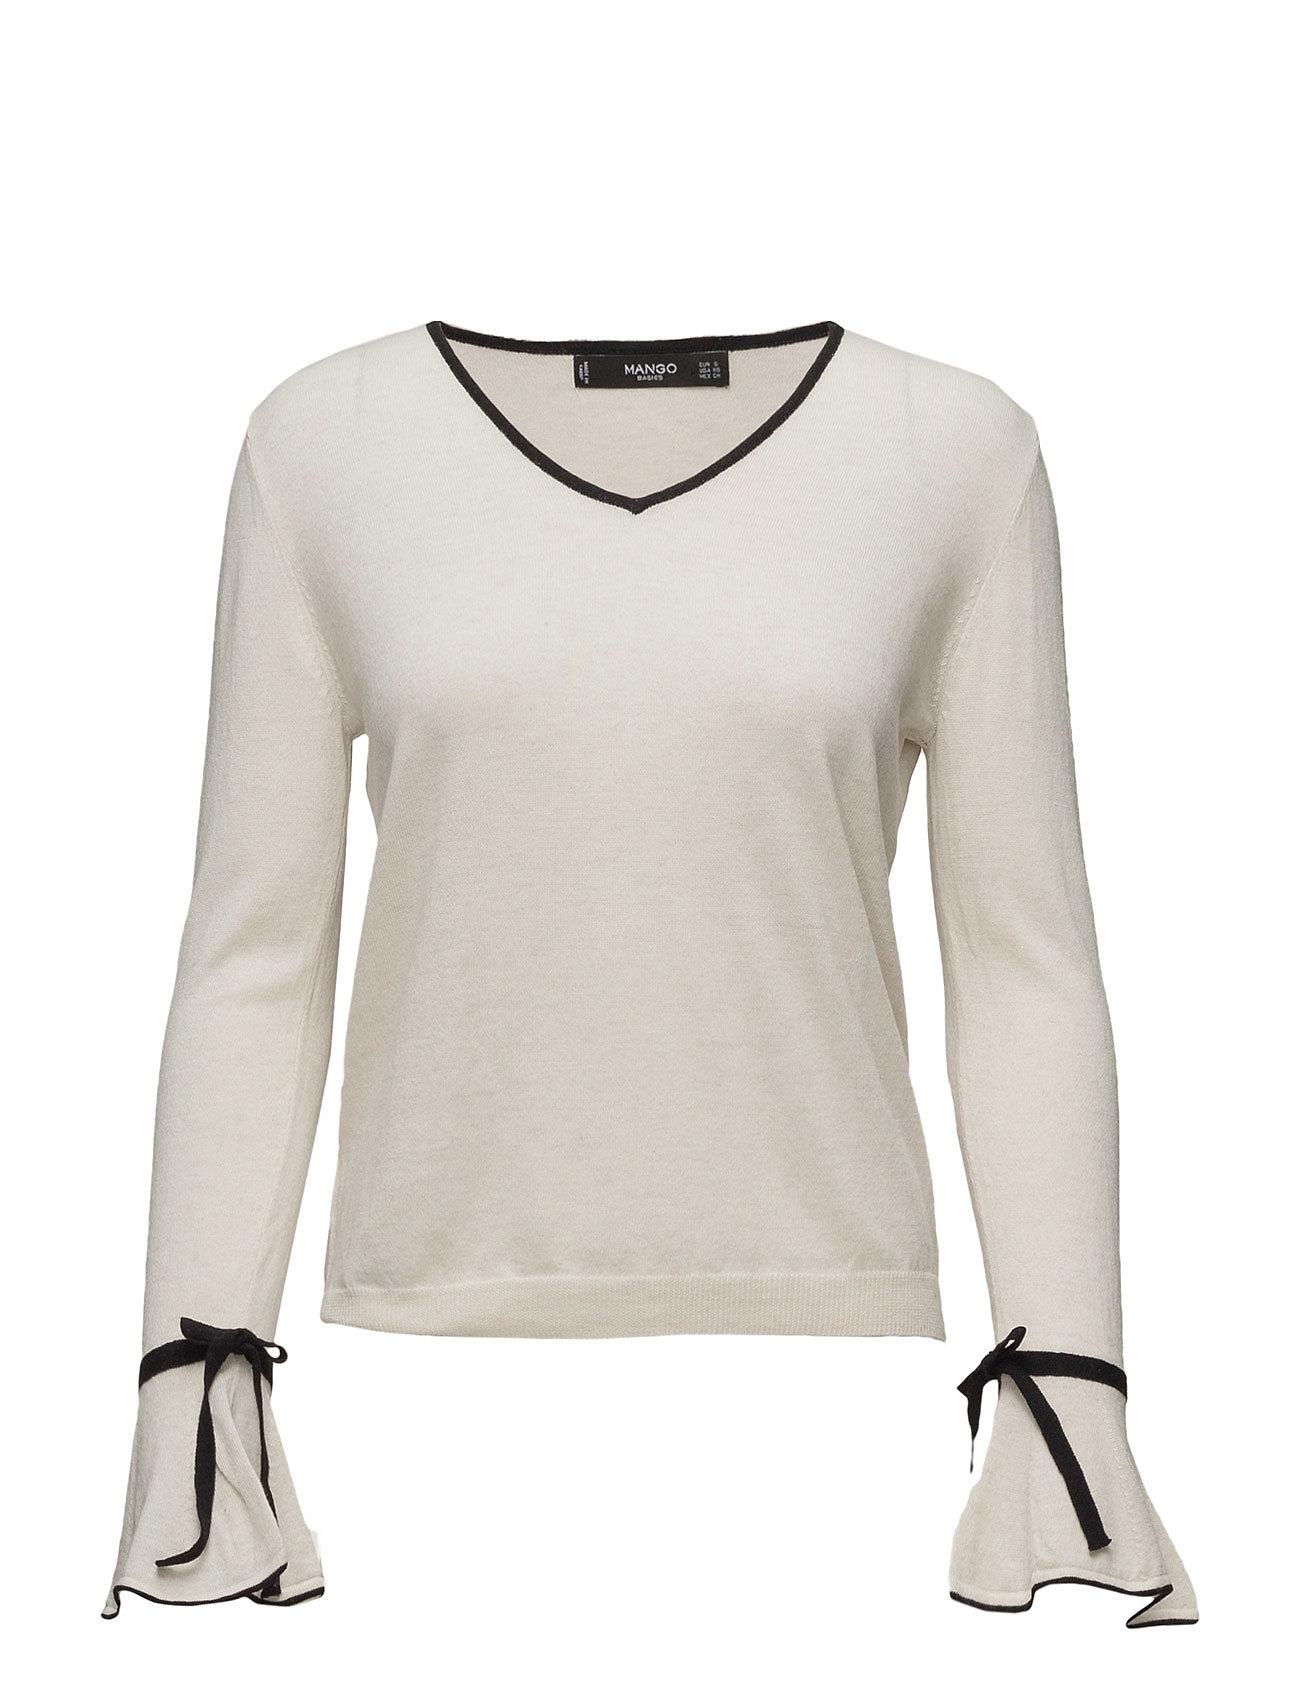 e259dfdb Bestil Flared Sleeve Cotton-Blend Jumper Mango Sweatshirts i Light Beige  til Damer hos Boozt.dk